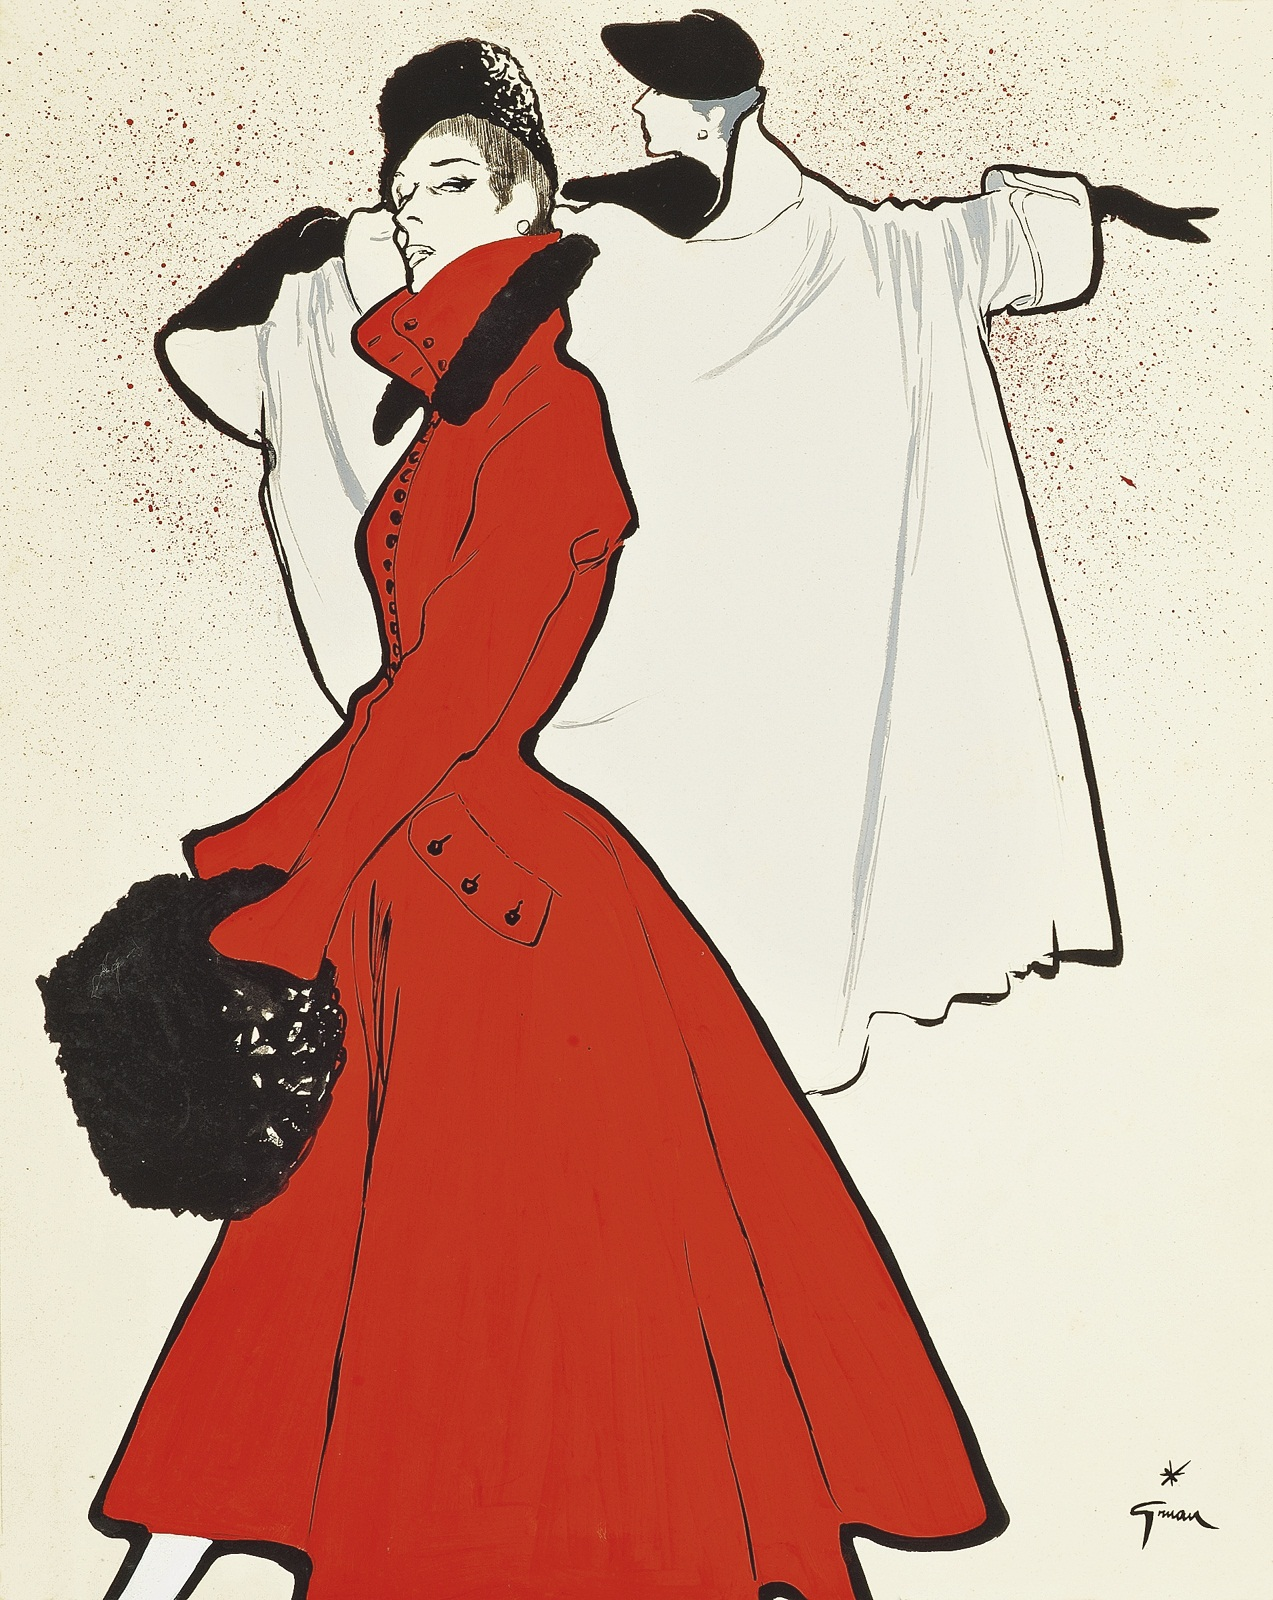 Rene-Gruau-manteau-rouge-1950.jpg